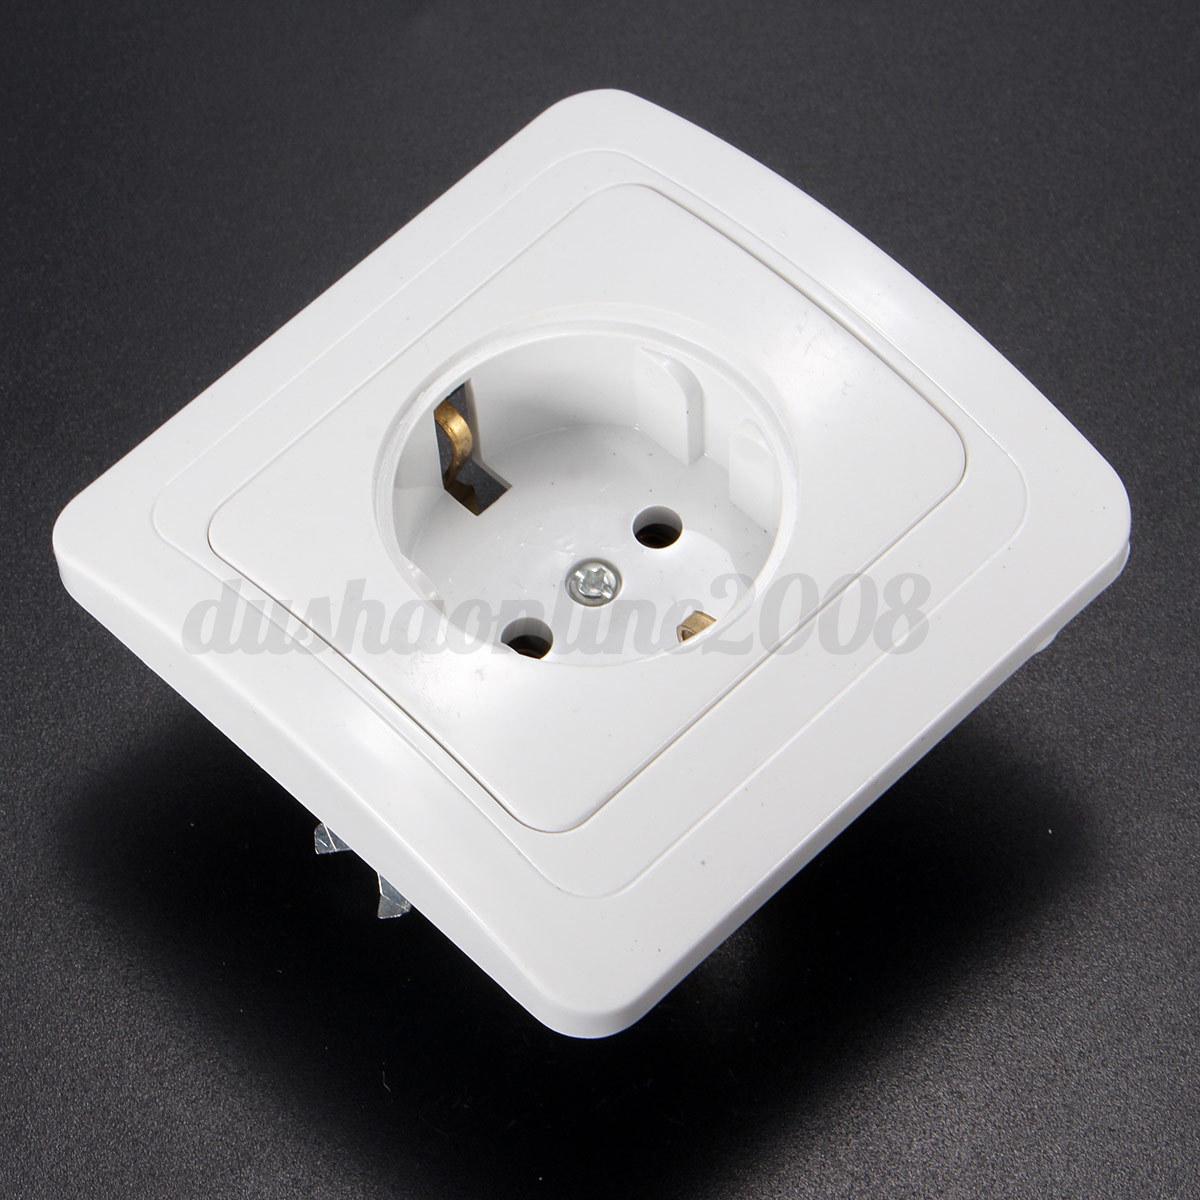 UK Universal Plug USB Outlet Wall Electrical Light Switch Socket F TV Faceplate eBay